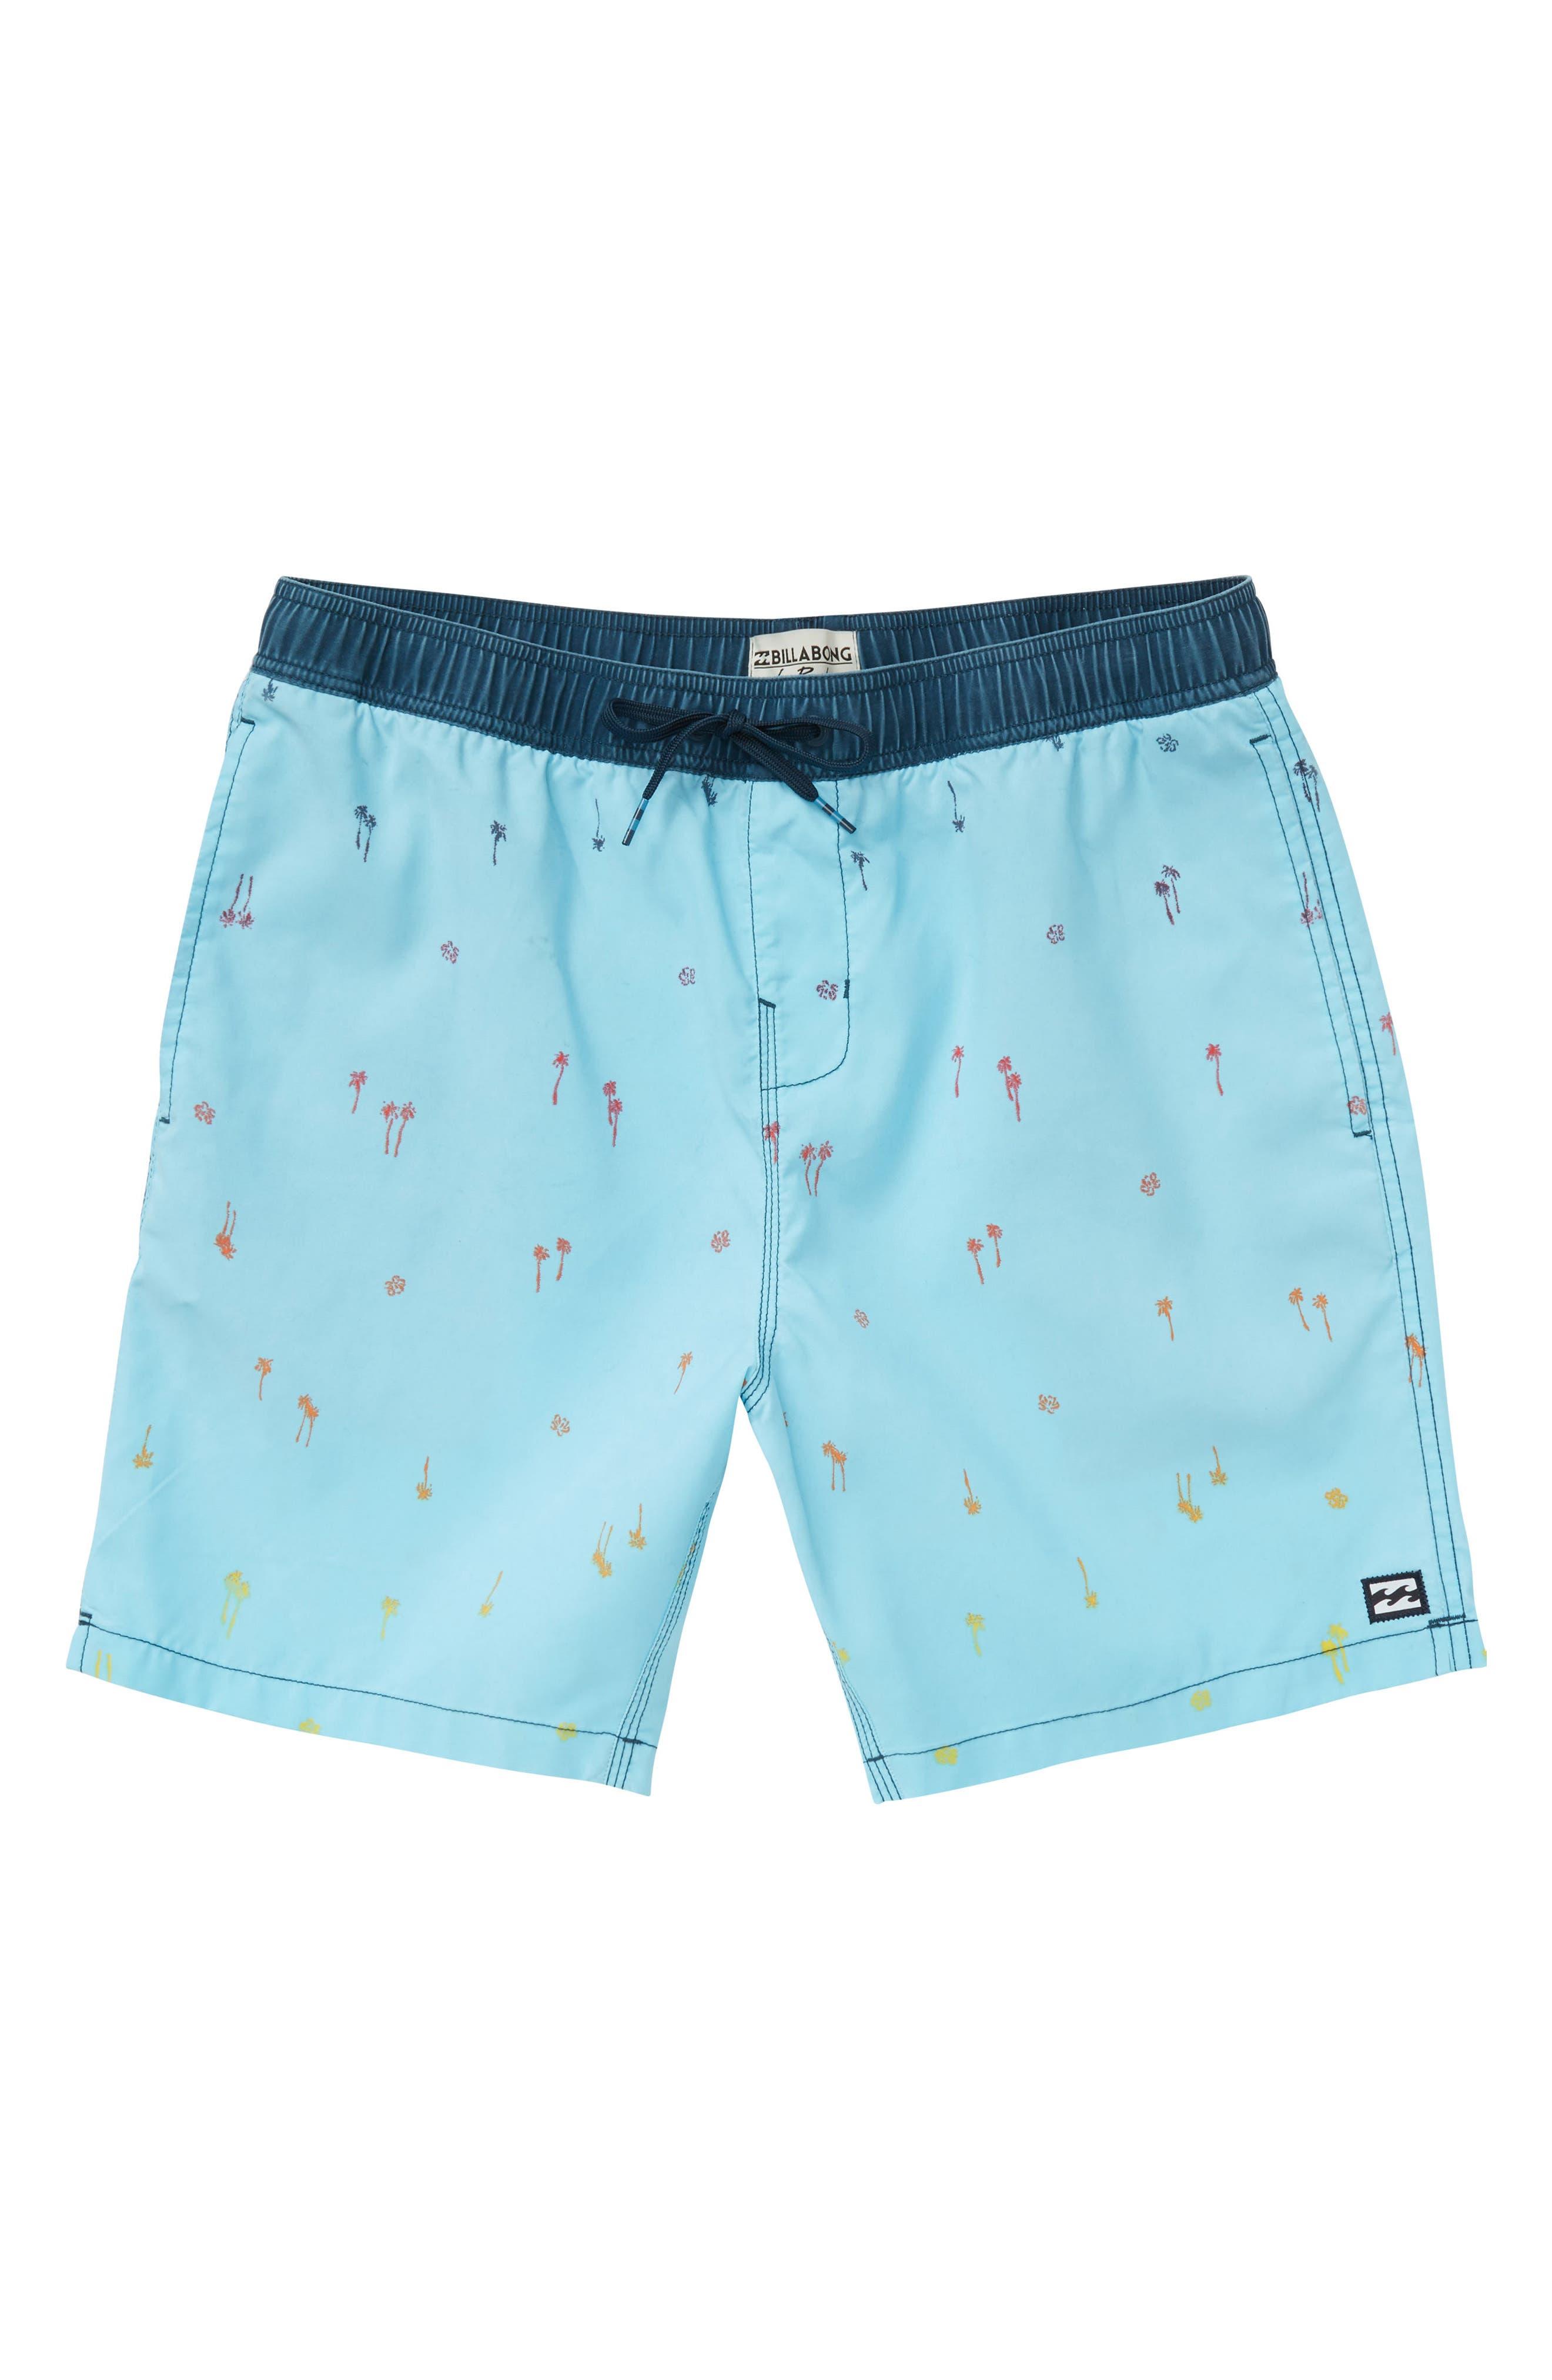 Sundays Layback Swim Trunks,                         Main,                         color, Light Blue